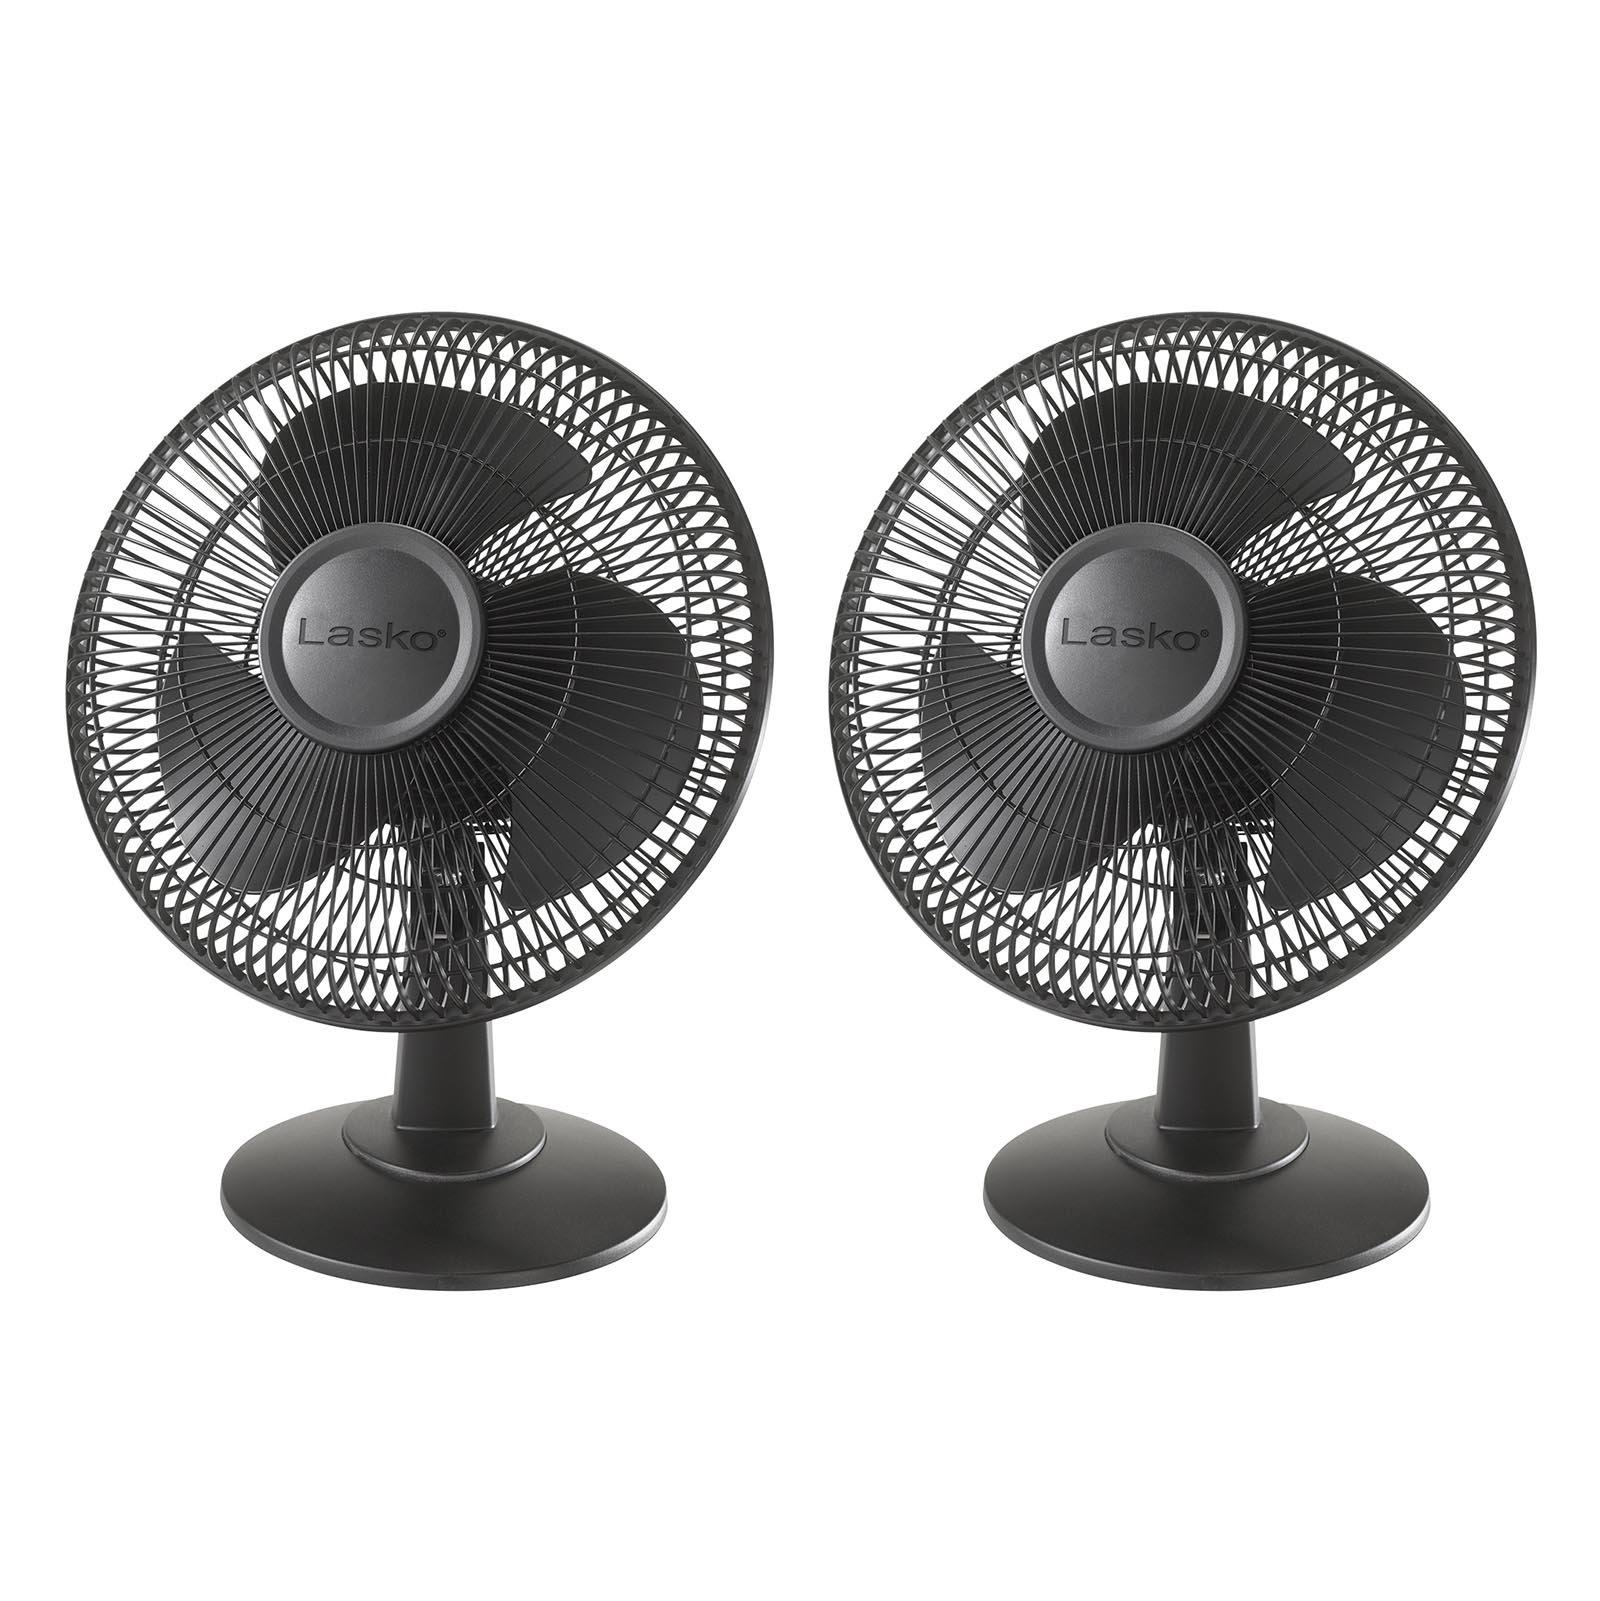 "Lasko 12"" 3 Speed Portable Oscillating Small Floor or Table Fan, Black (2 Pack)"